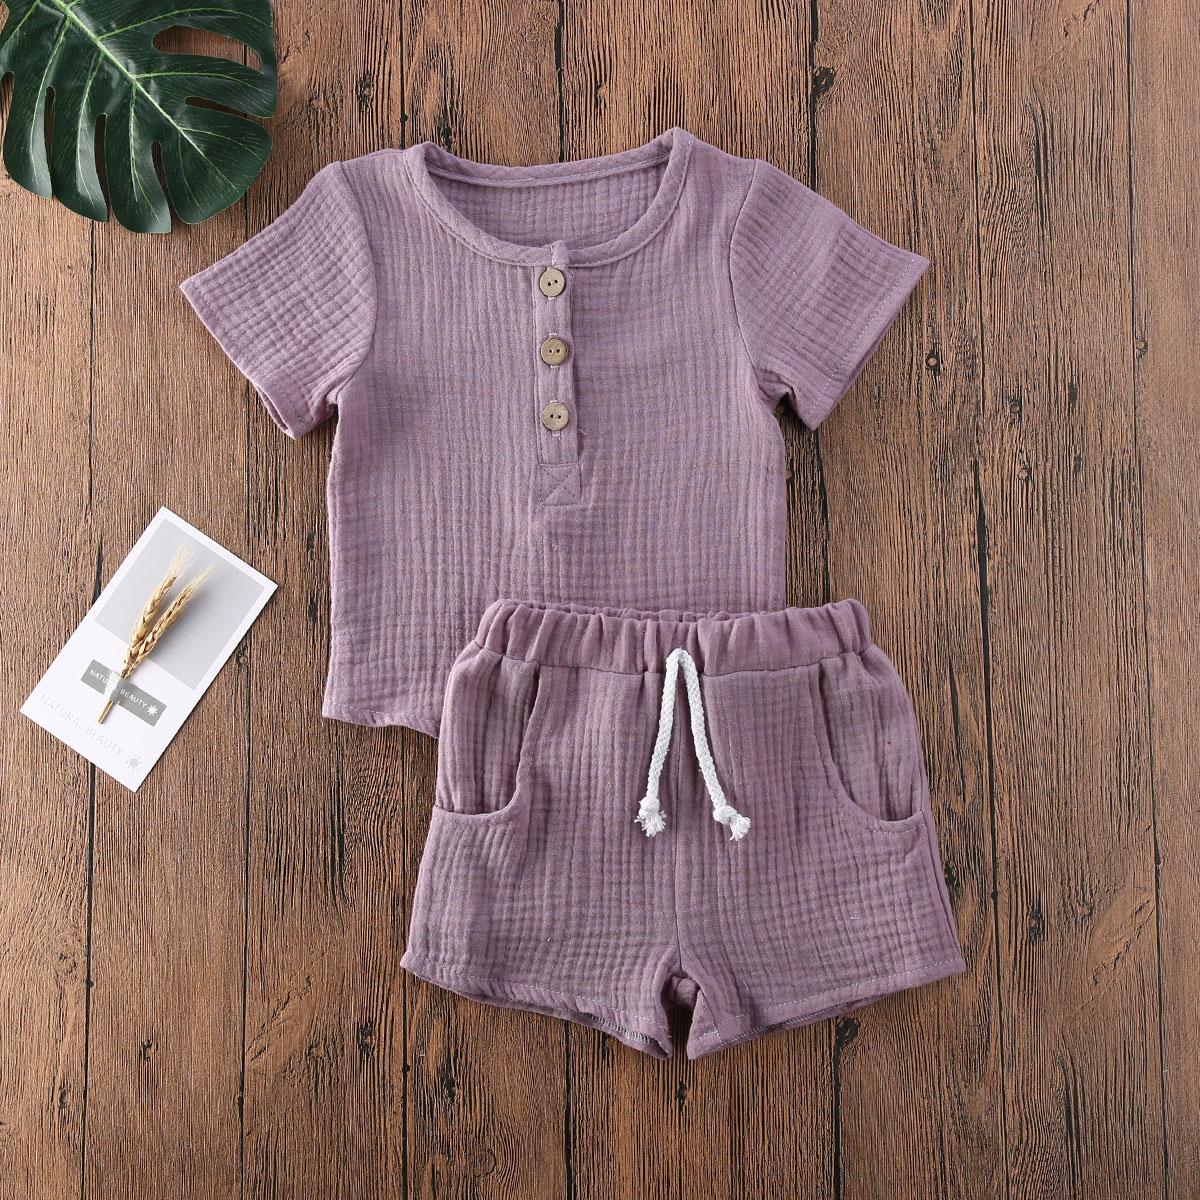 Toddler Kids Baby Boys Autumn Casual Clothes T-shirt Tops/&Pants Outfit 2Pcs Set